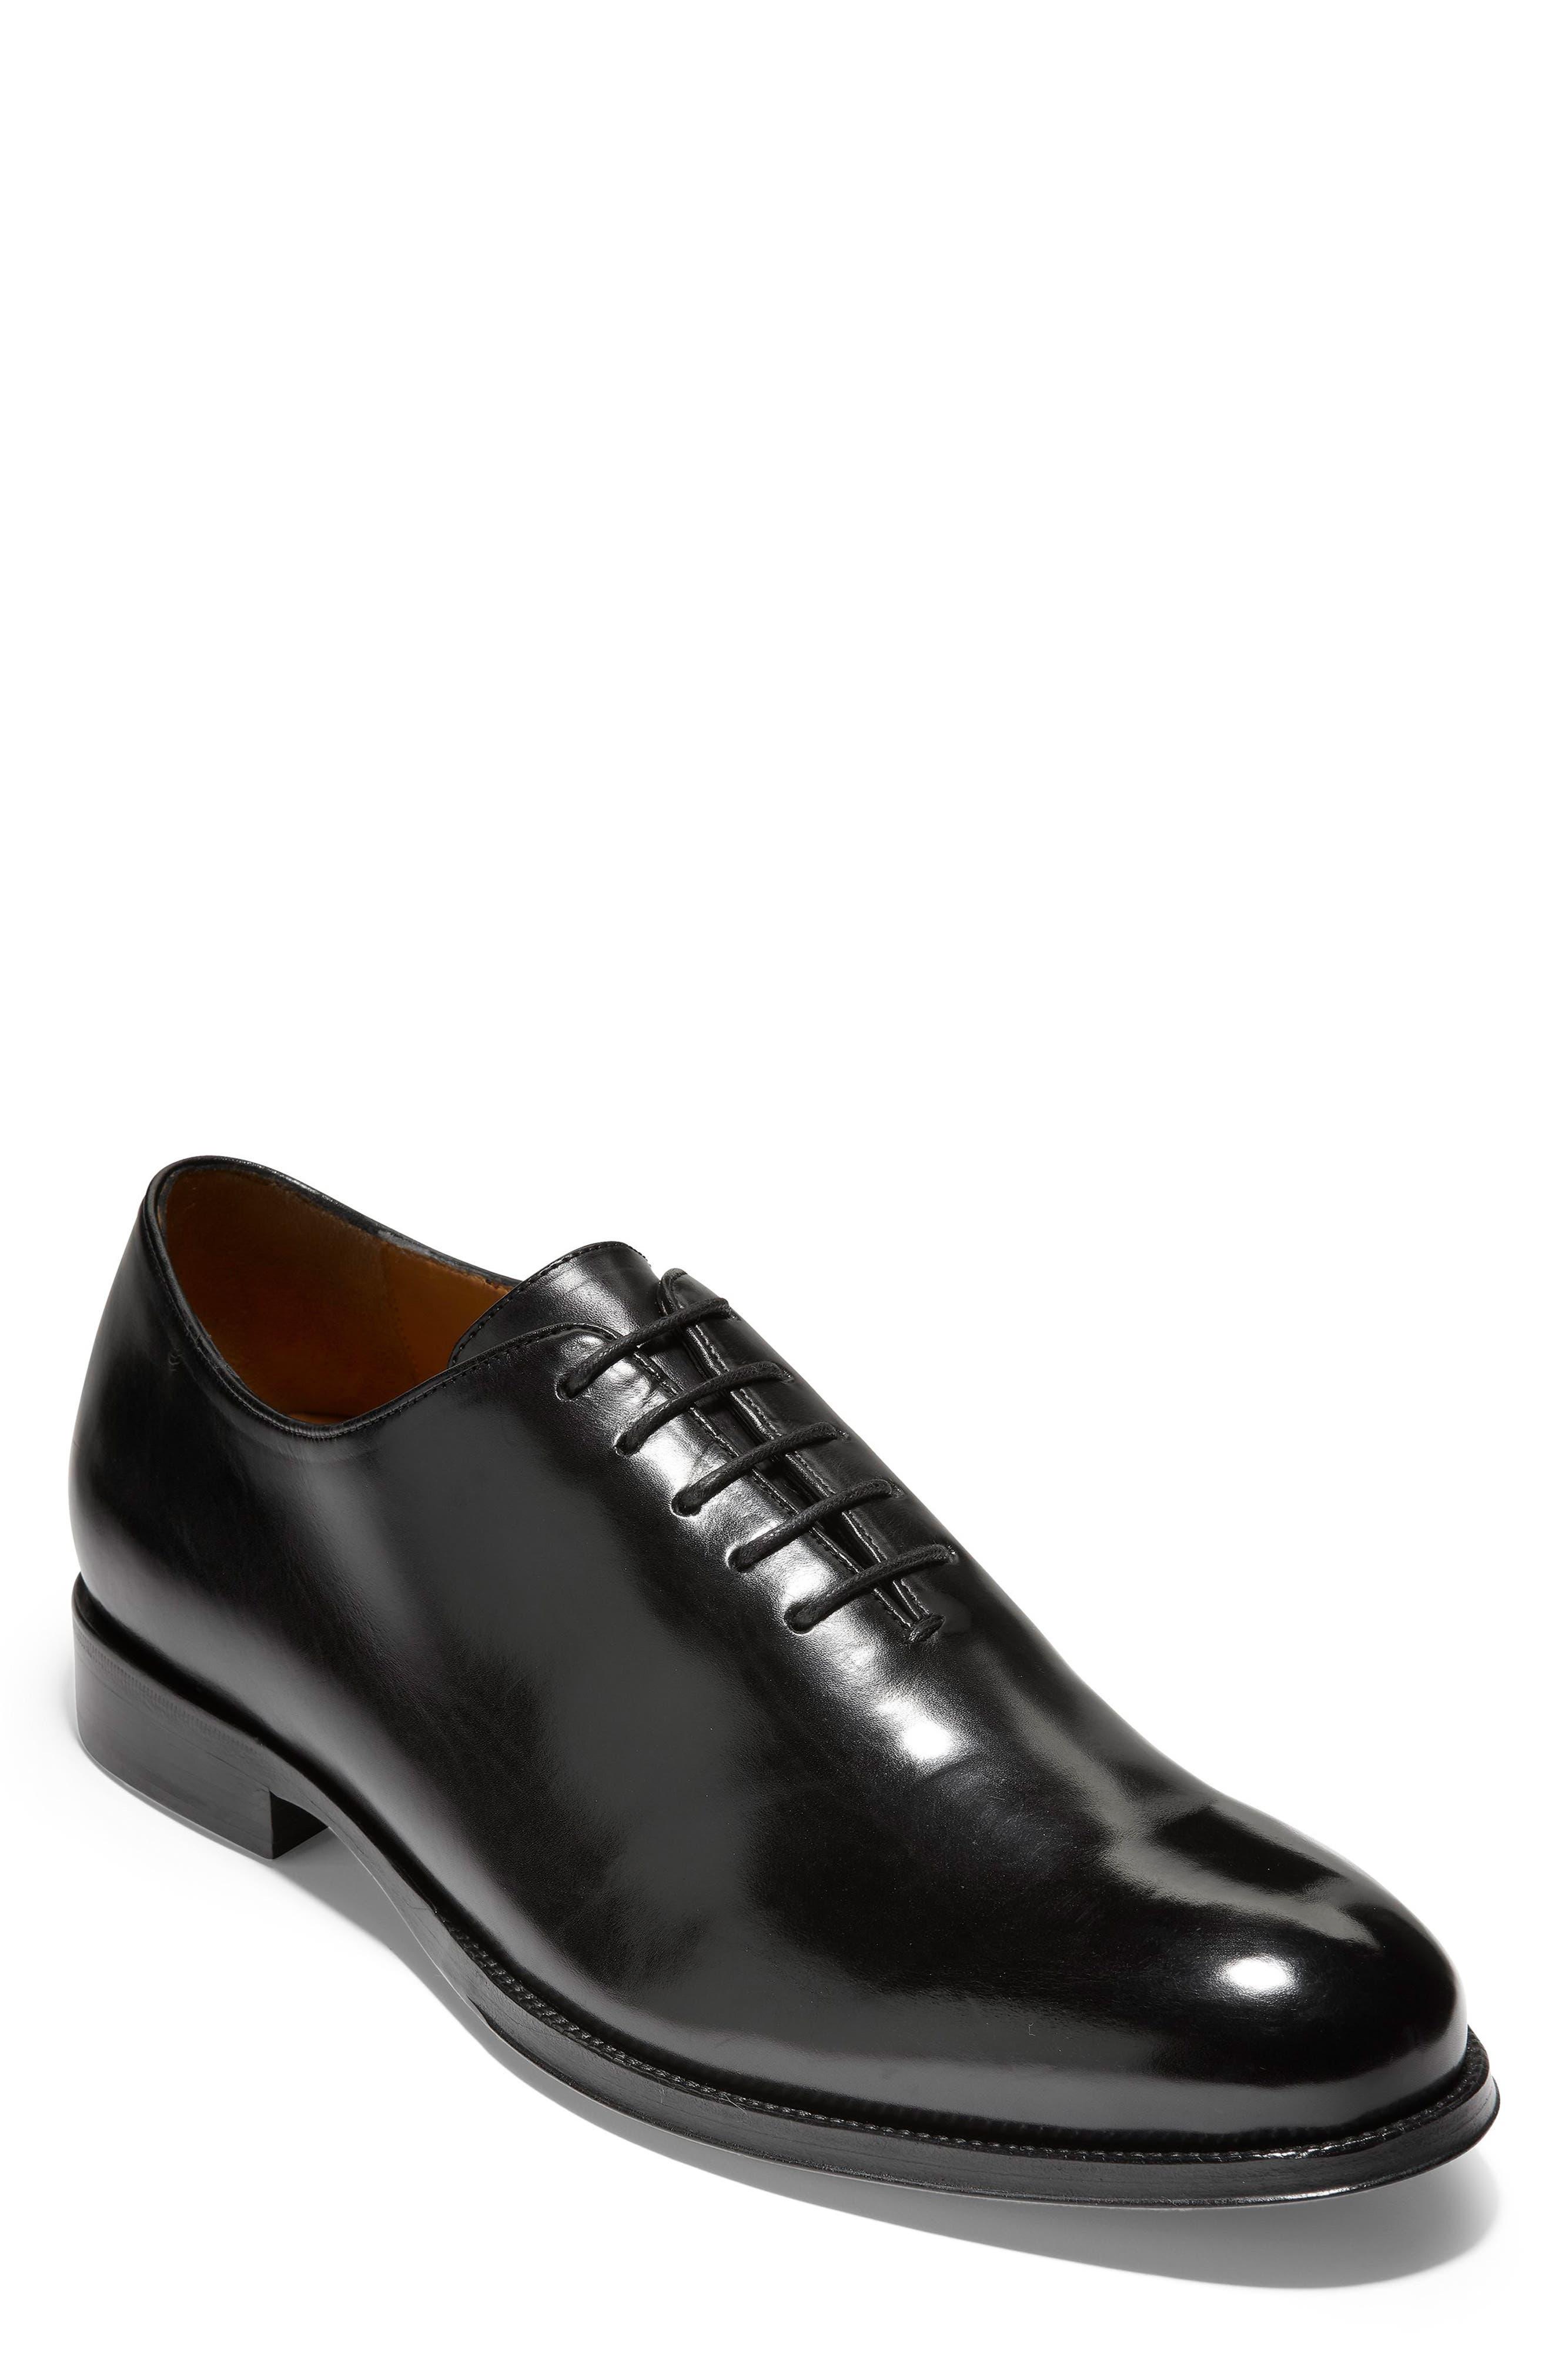 COLE HAAN, American Classics Gramercy Whole Cut Shoe, Main thumbnail 1, color, BLACK LEATHER